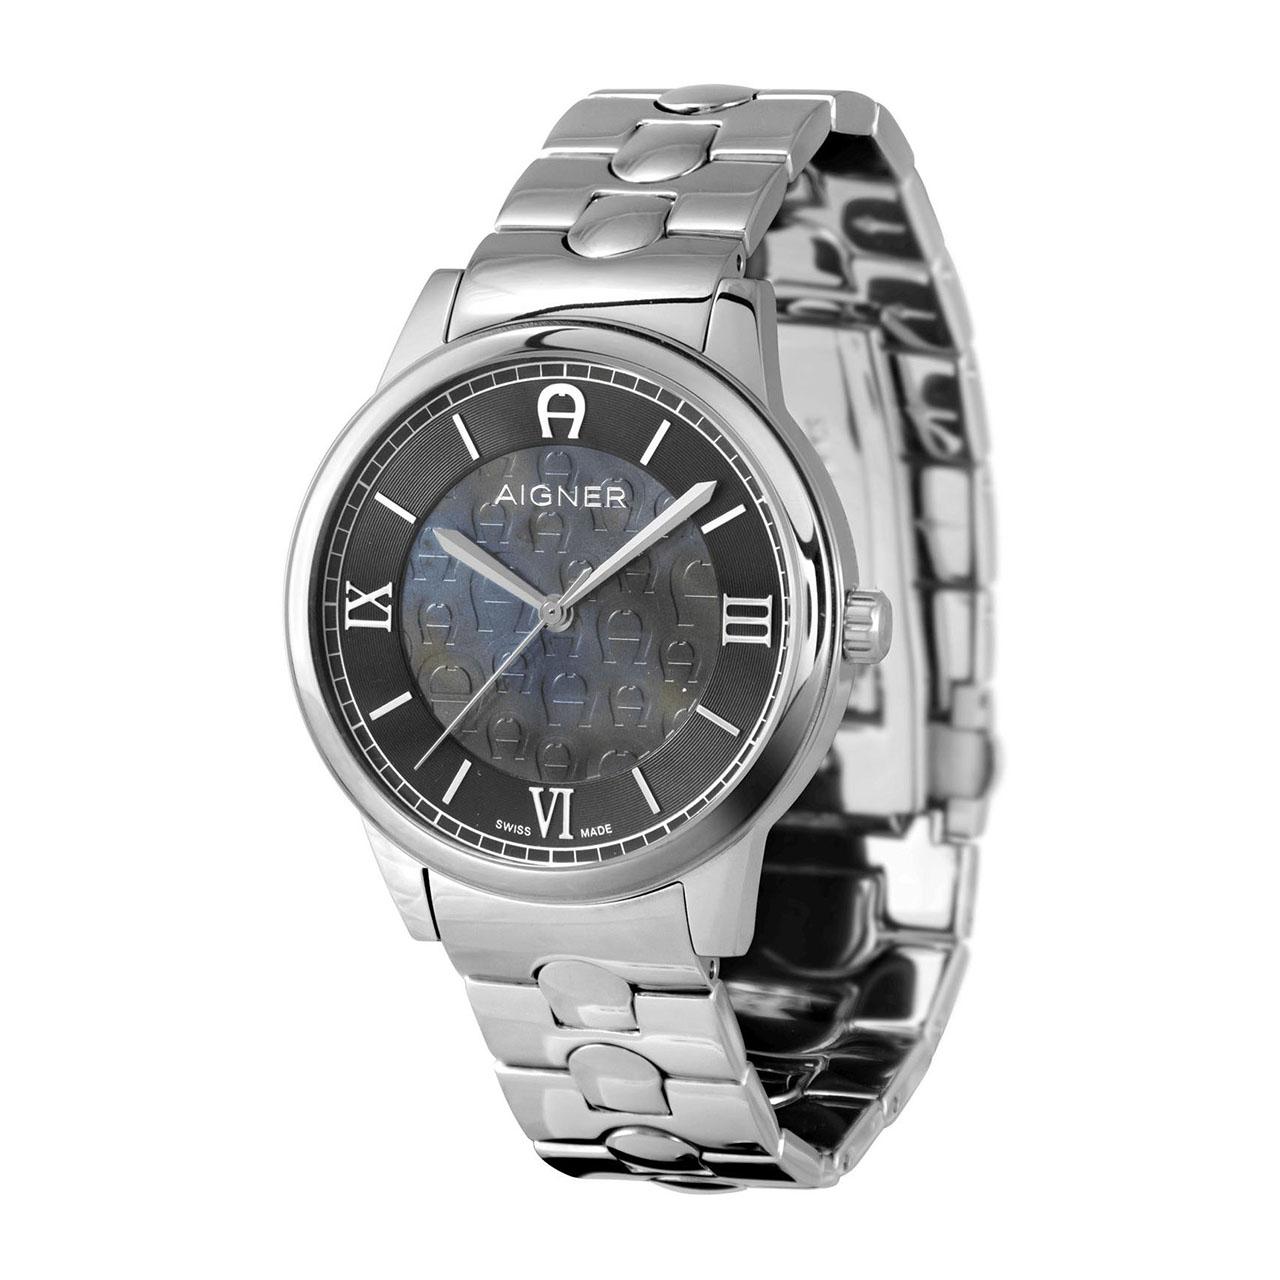 ساعت زنانه برند اگنر مدل A24249